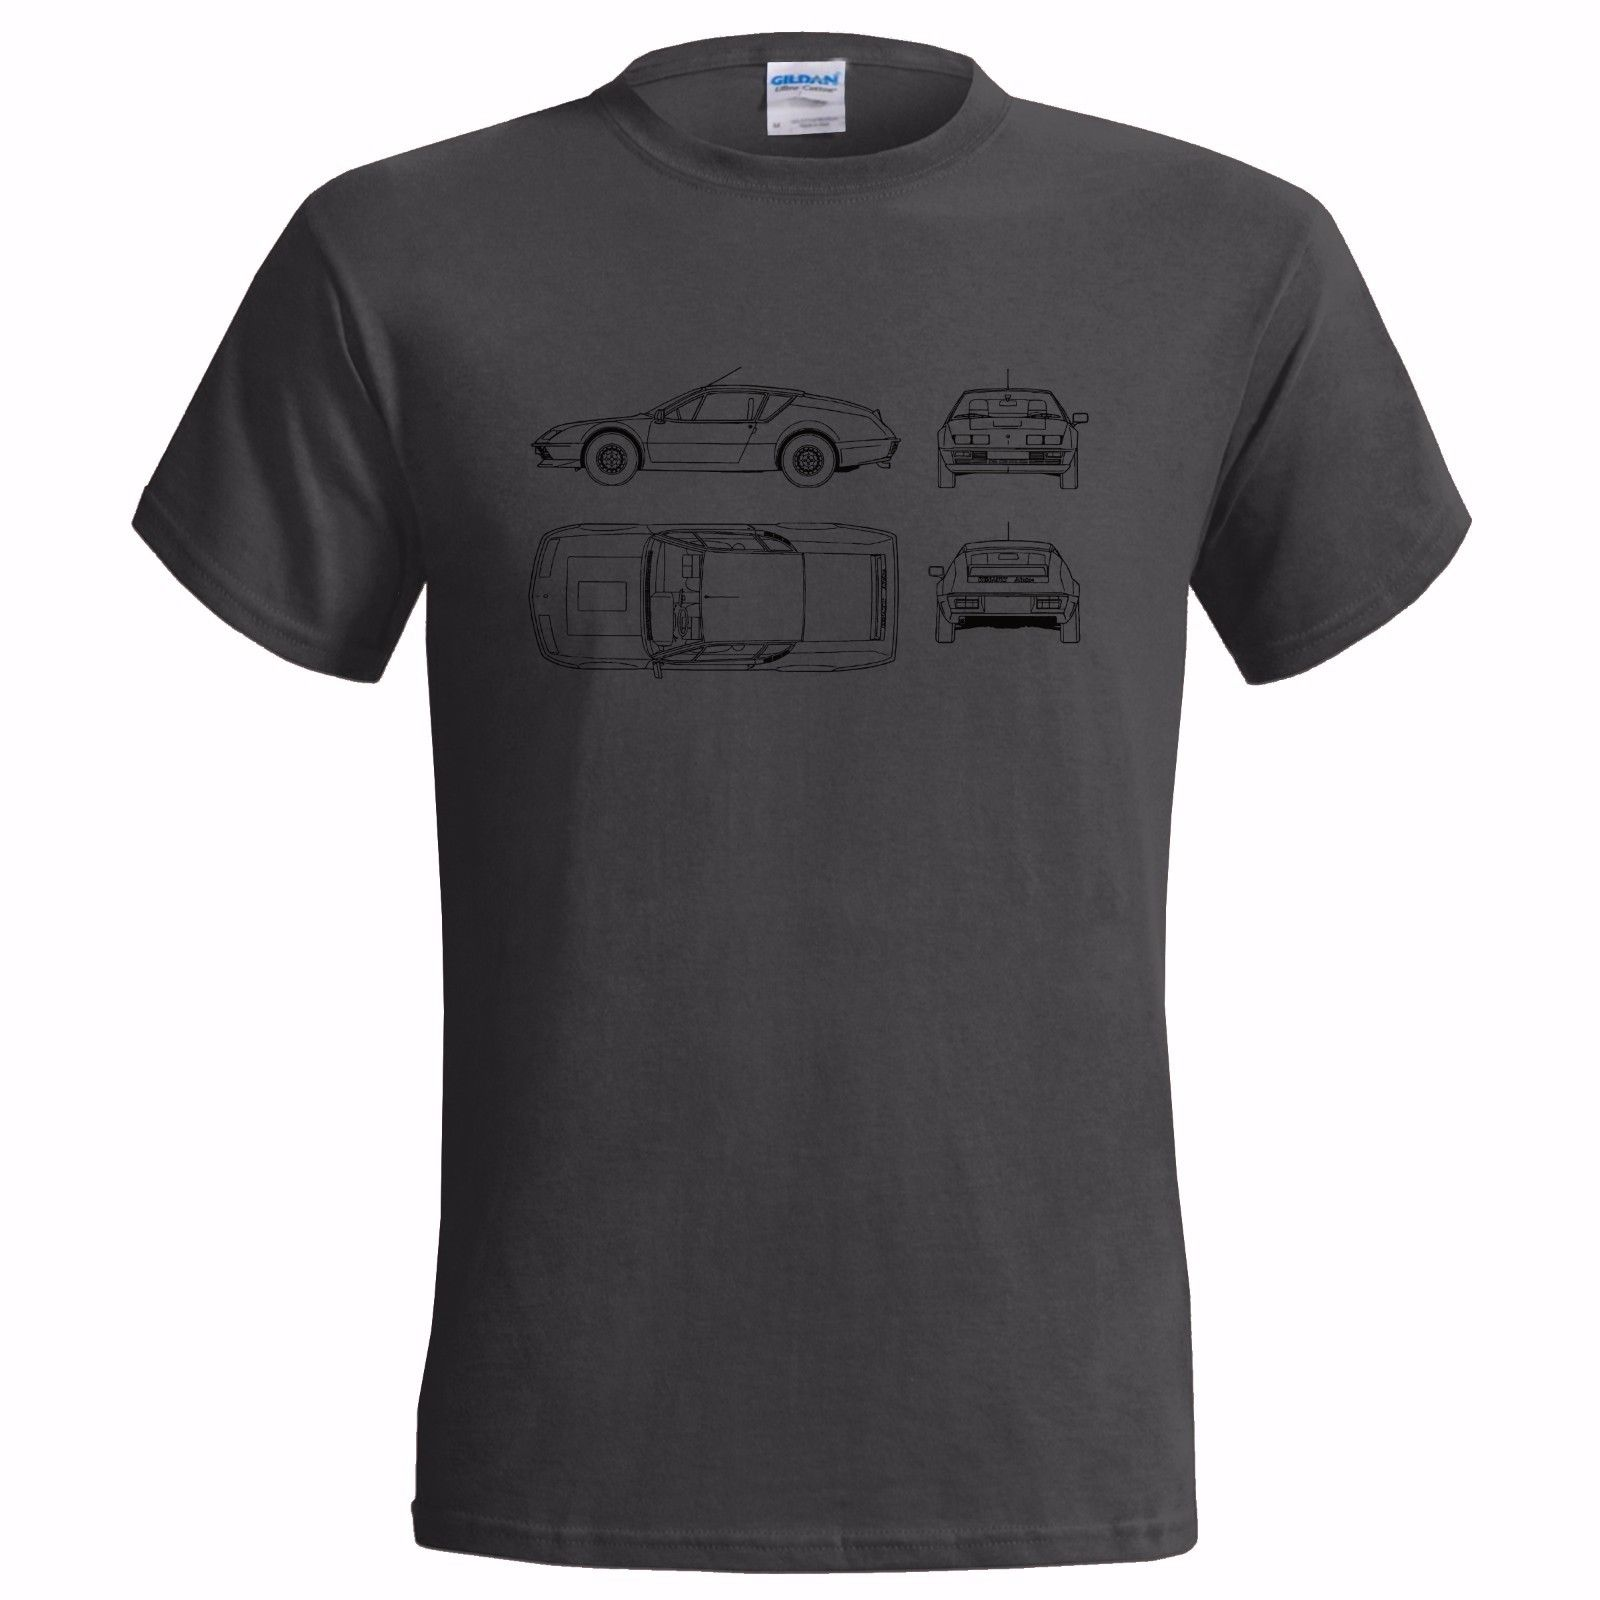 Clio White T Shirt Clio V6 Men/'s T Shirt Renault Choose Your Size V6